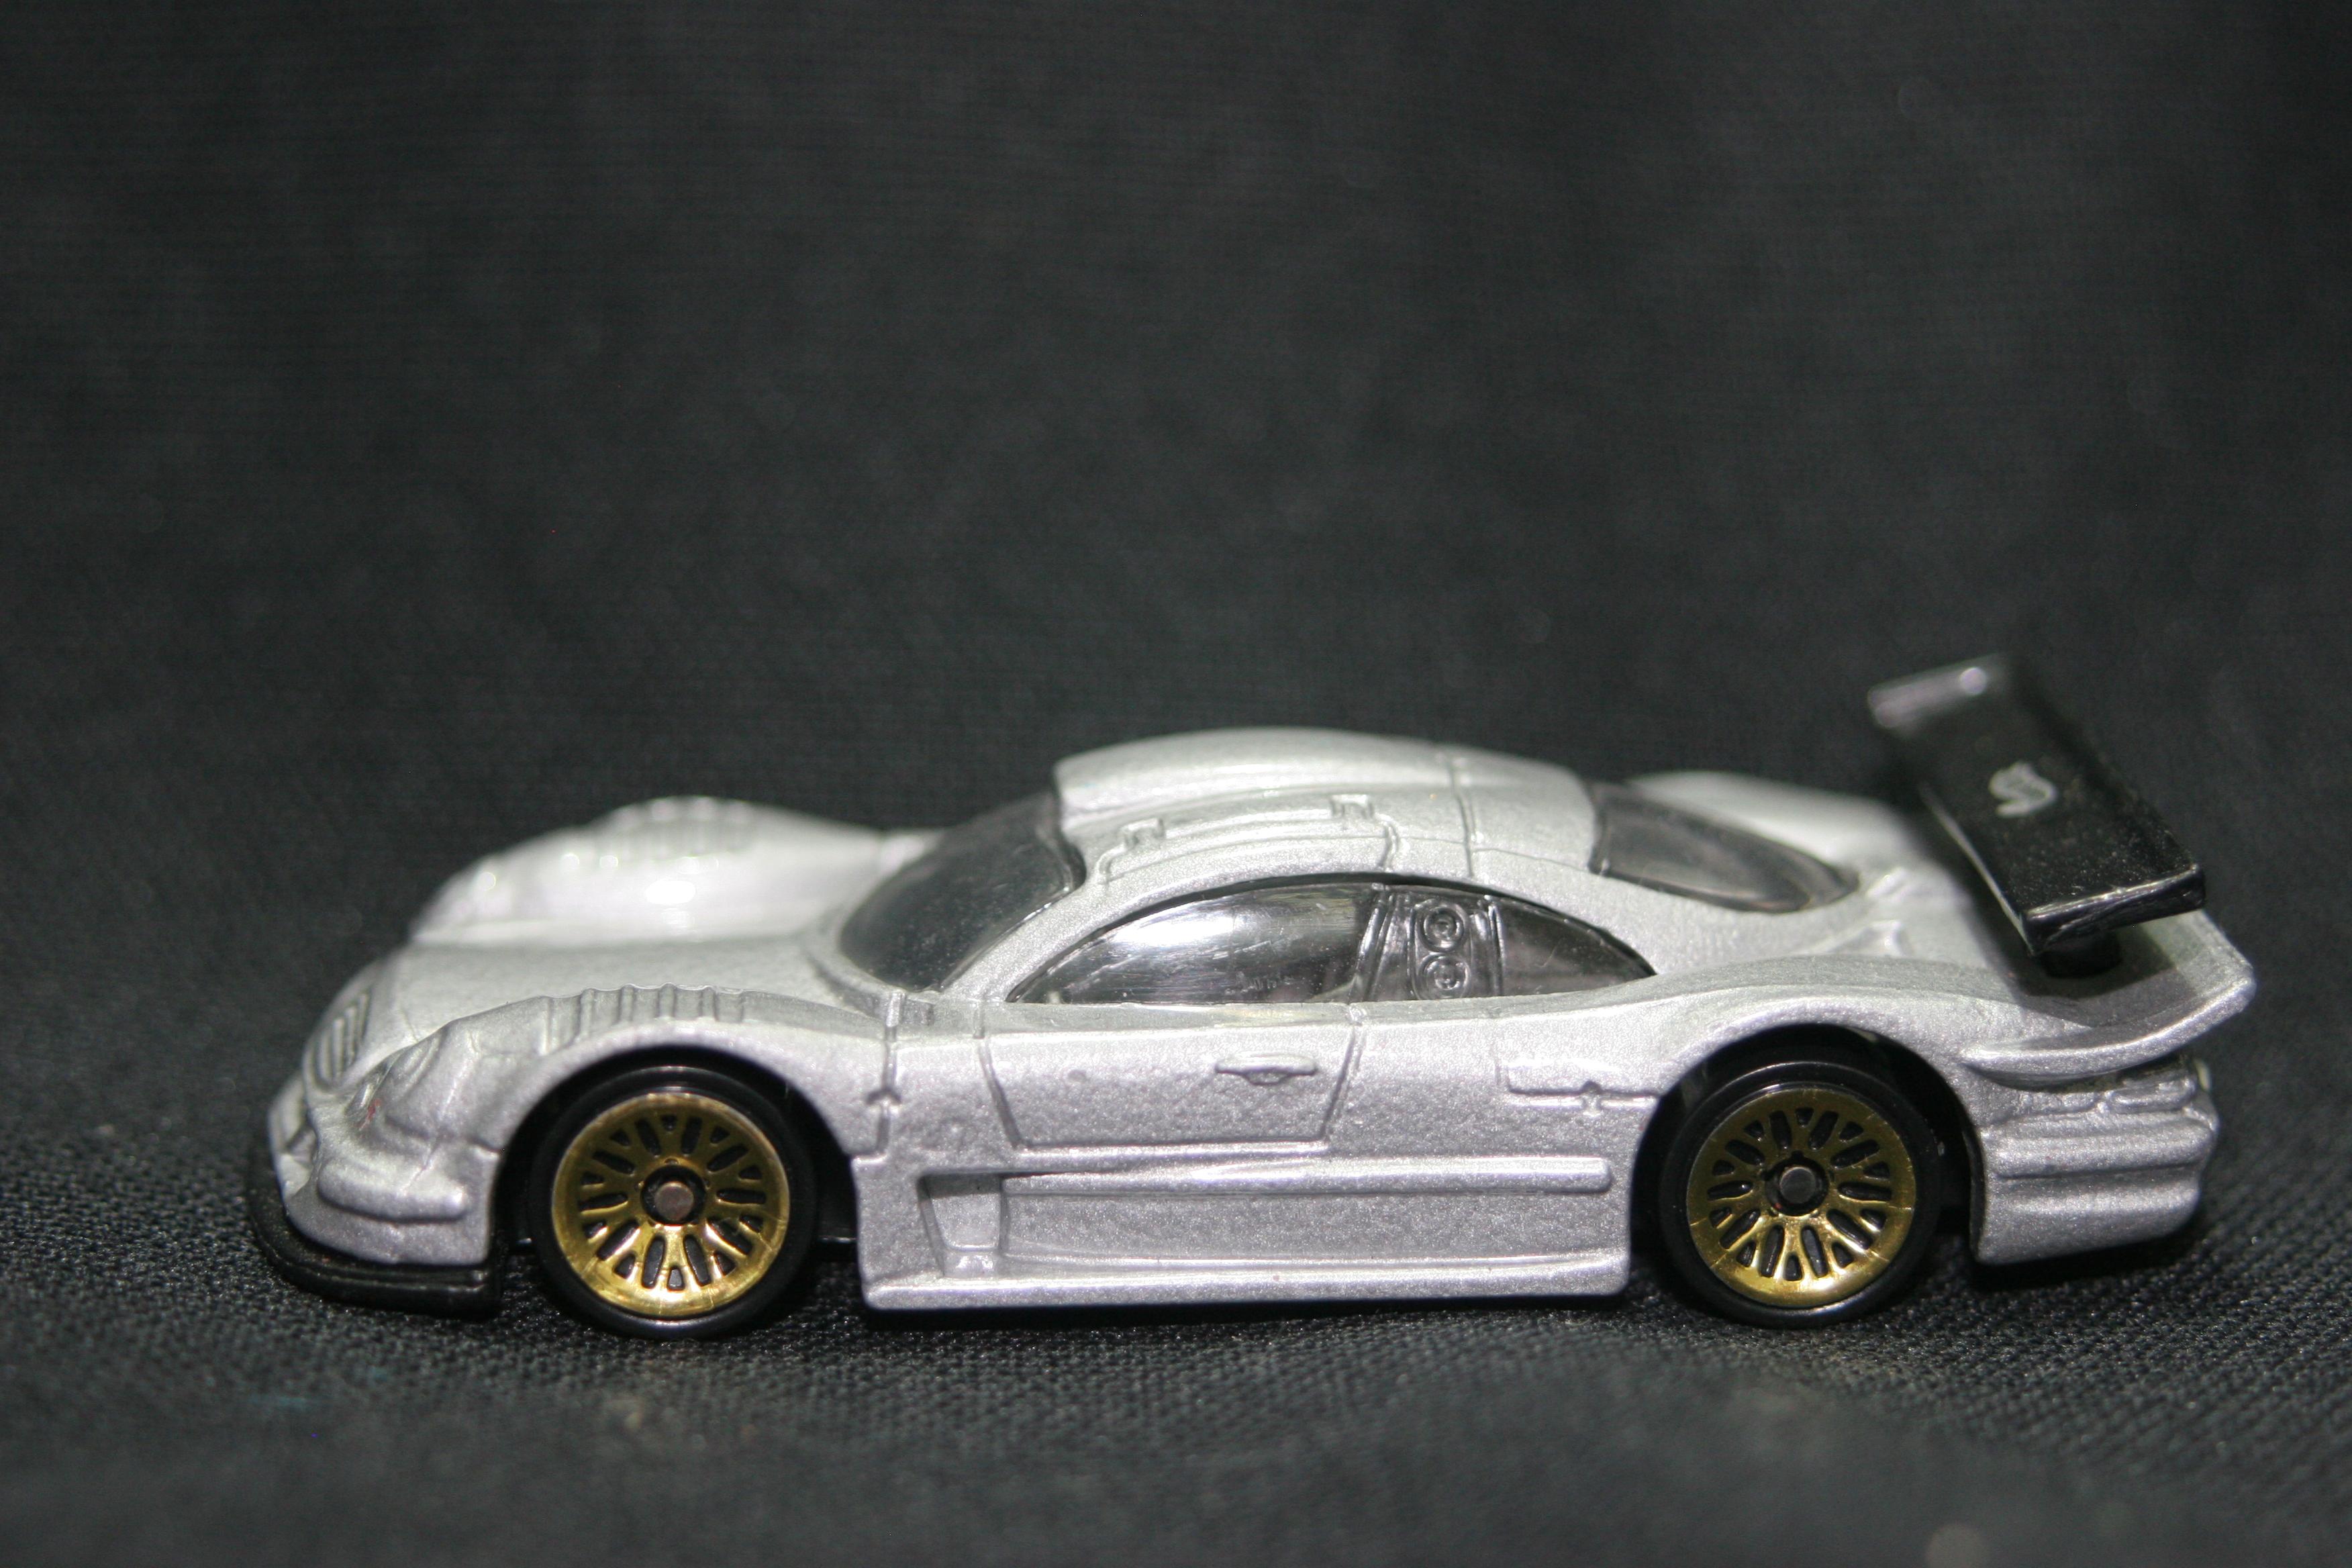 Mercedes CLK-LM